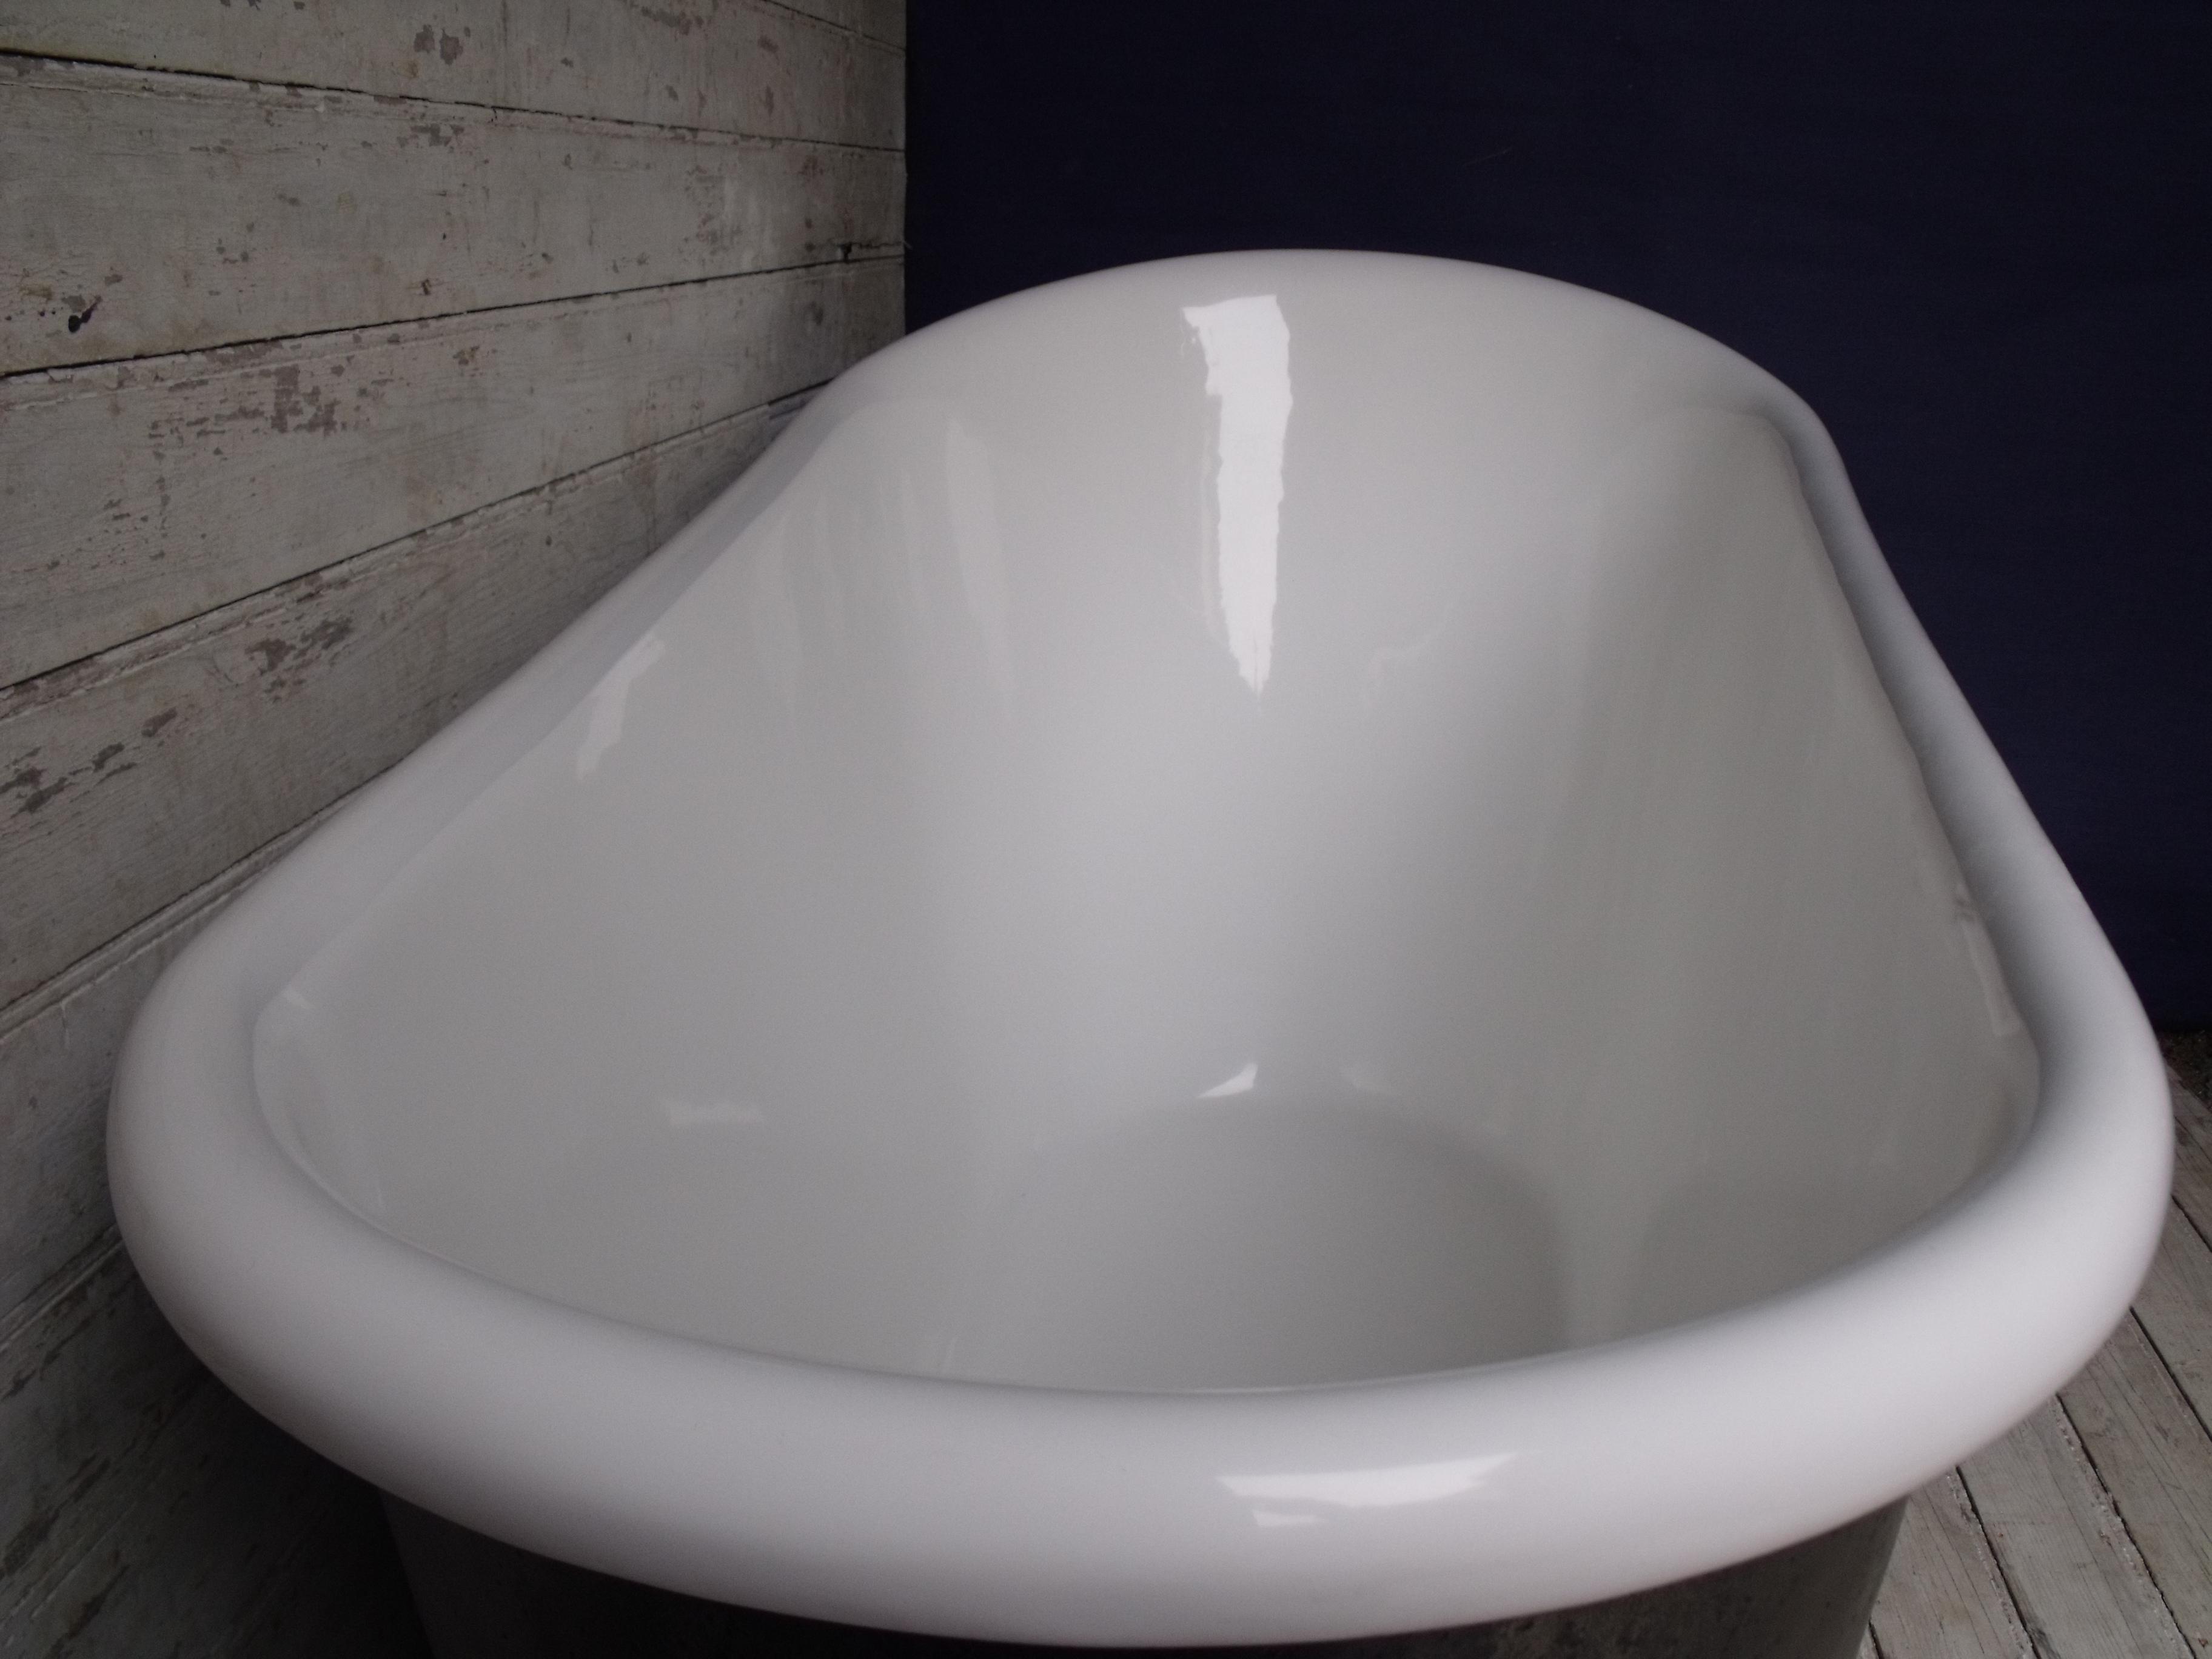 email baignoire interesting kit de rparation sanitaire. Black Bedroom Furniture Sets. Home Design Ideas